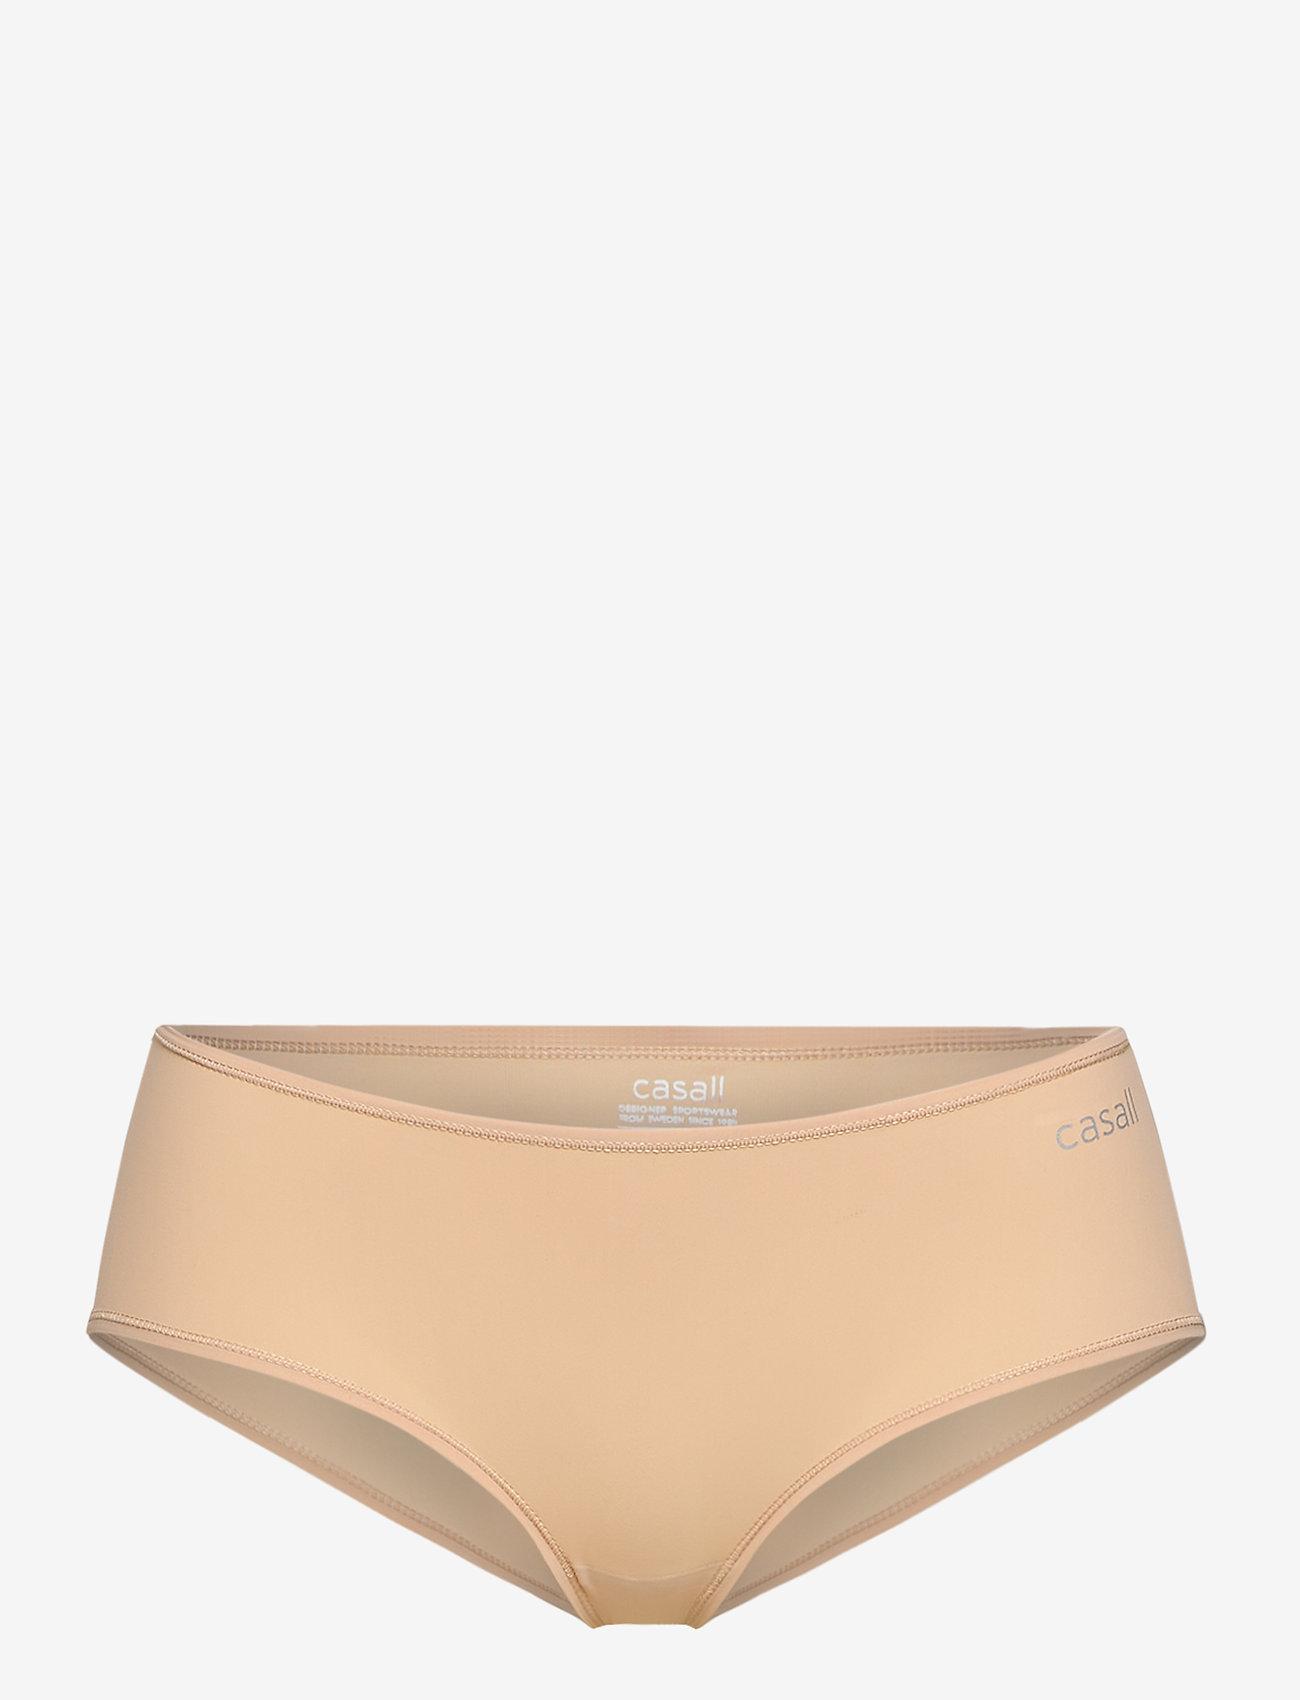 Casall - Hipster - slips - beige - 0